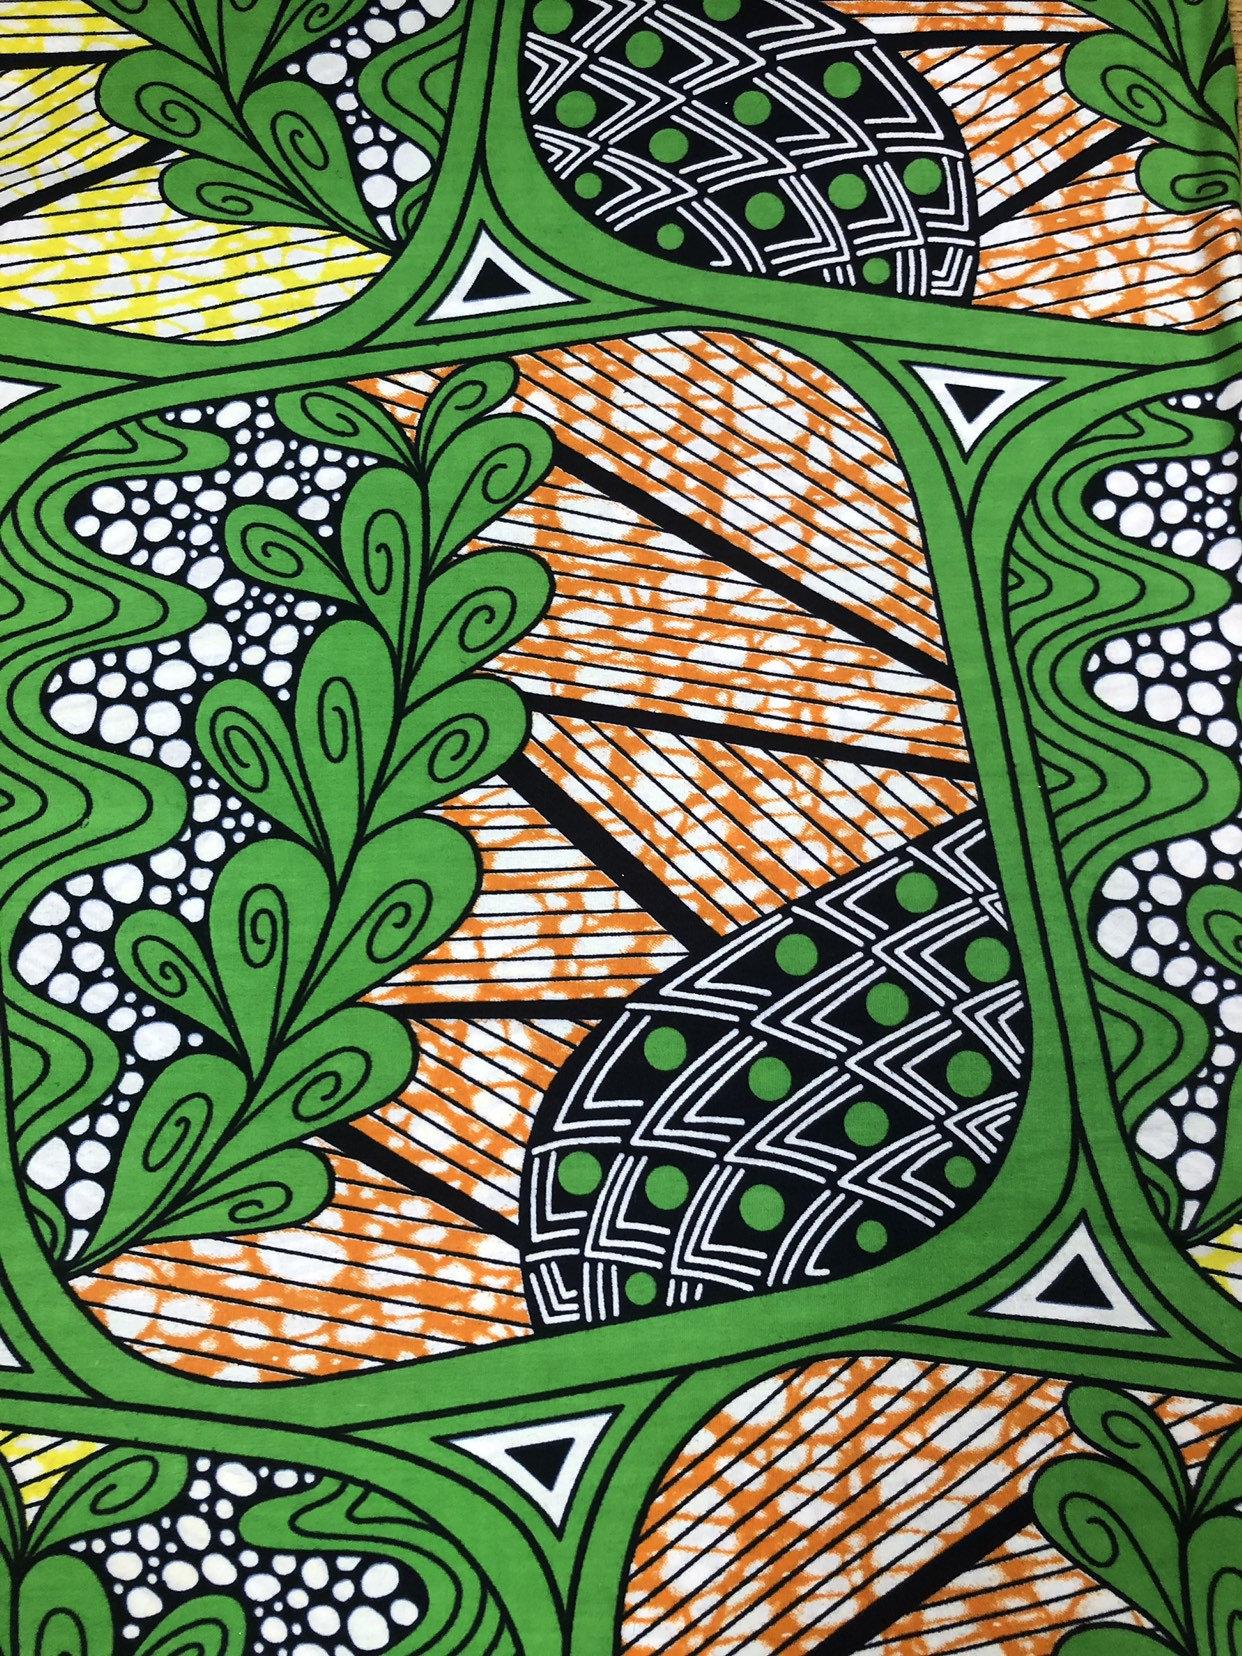 Wholesale Green Orange Brown Black White Leaves Ankara African Print Fabric 6 Yards